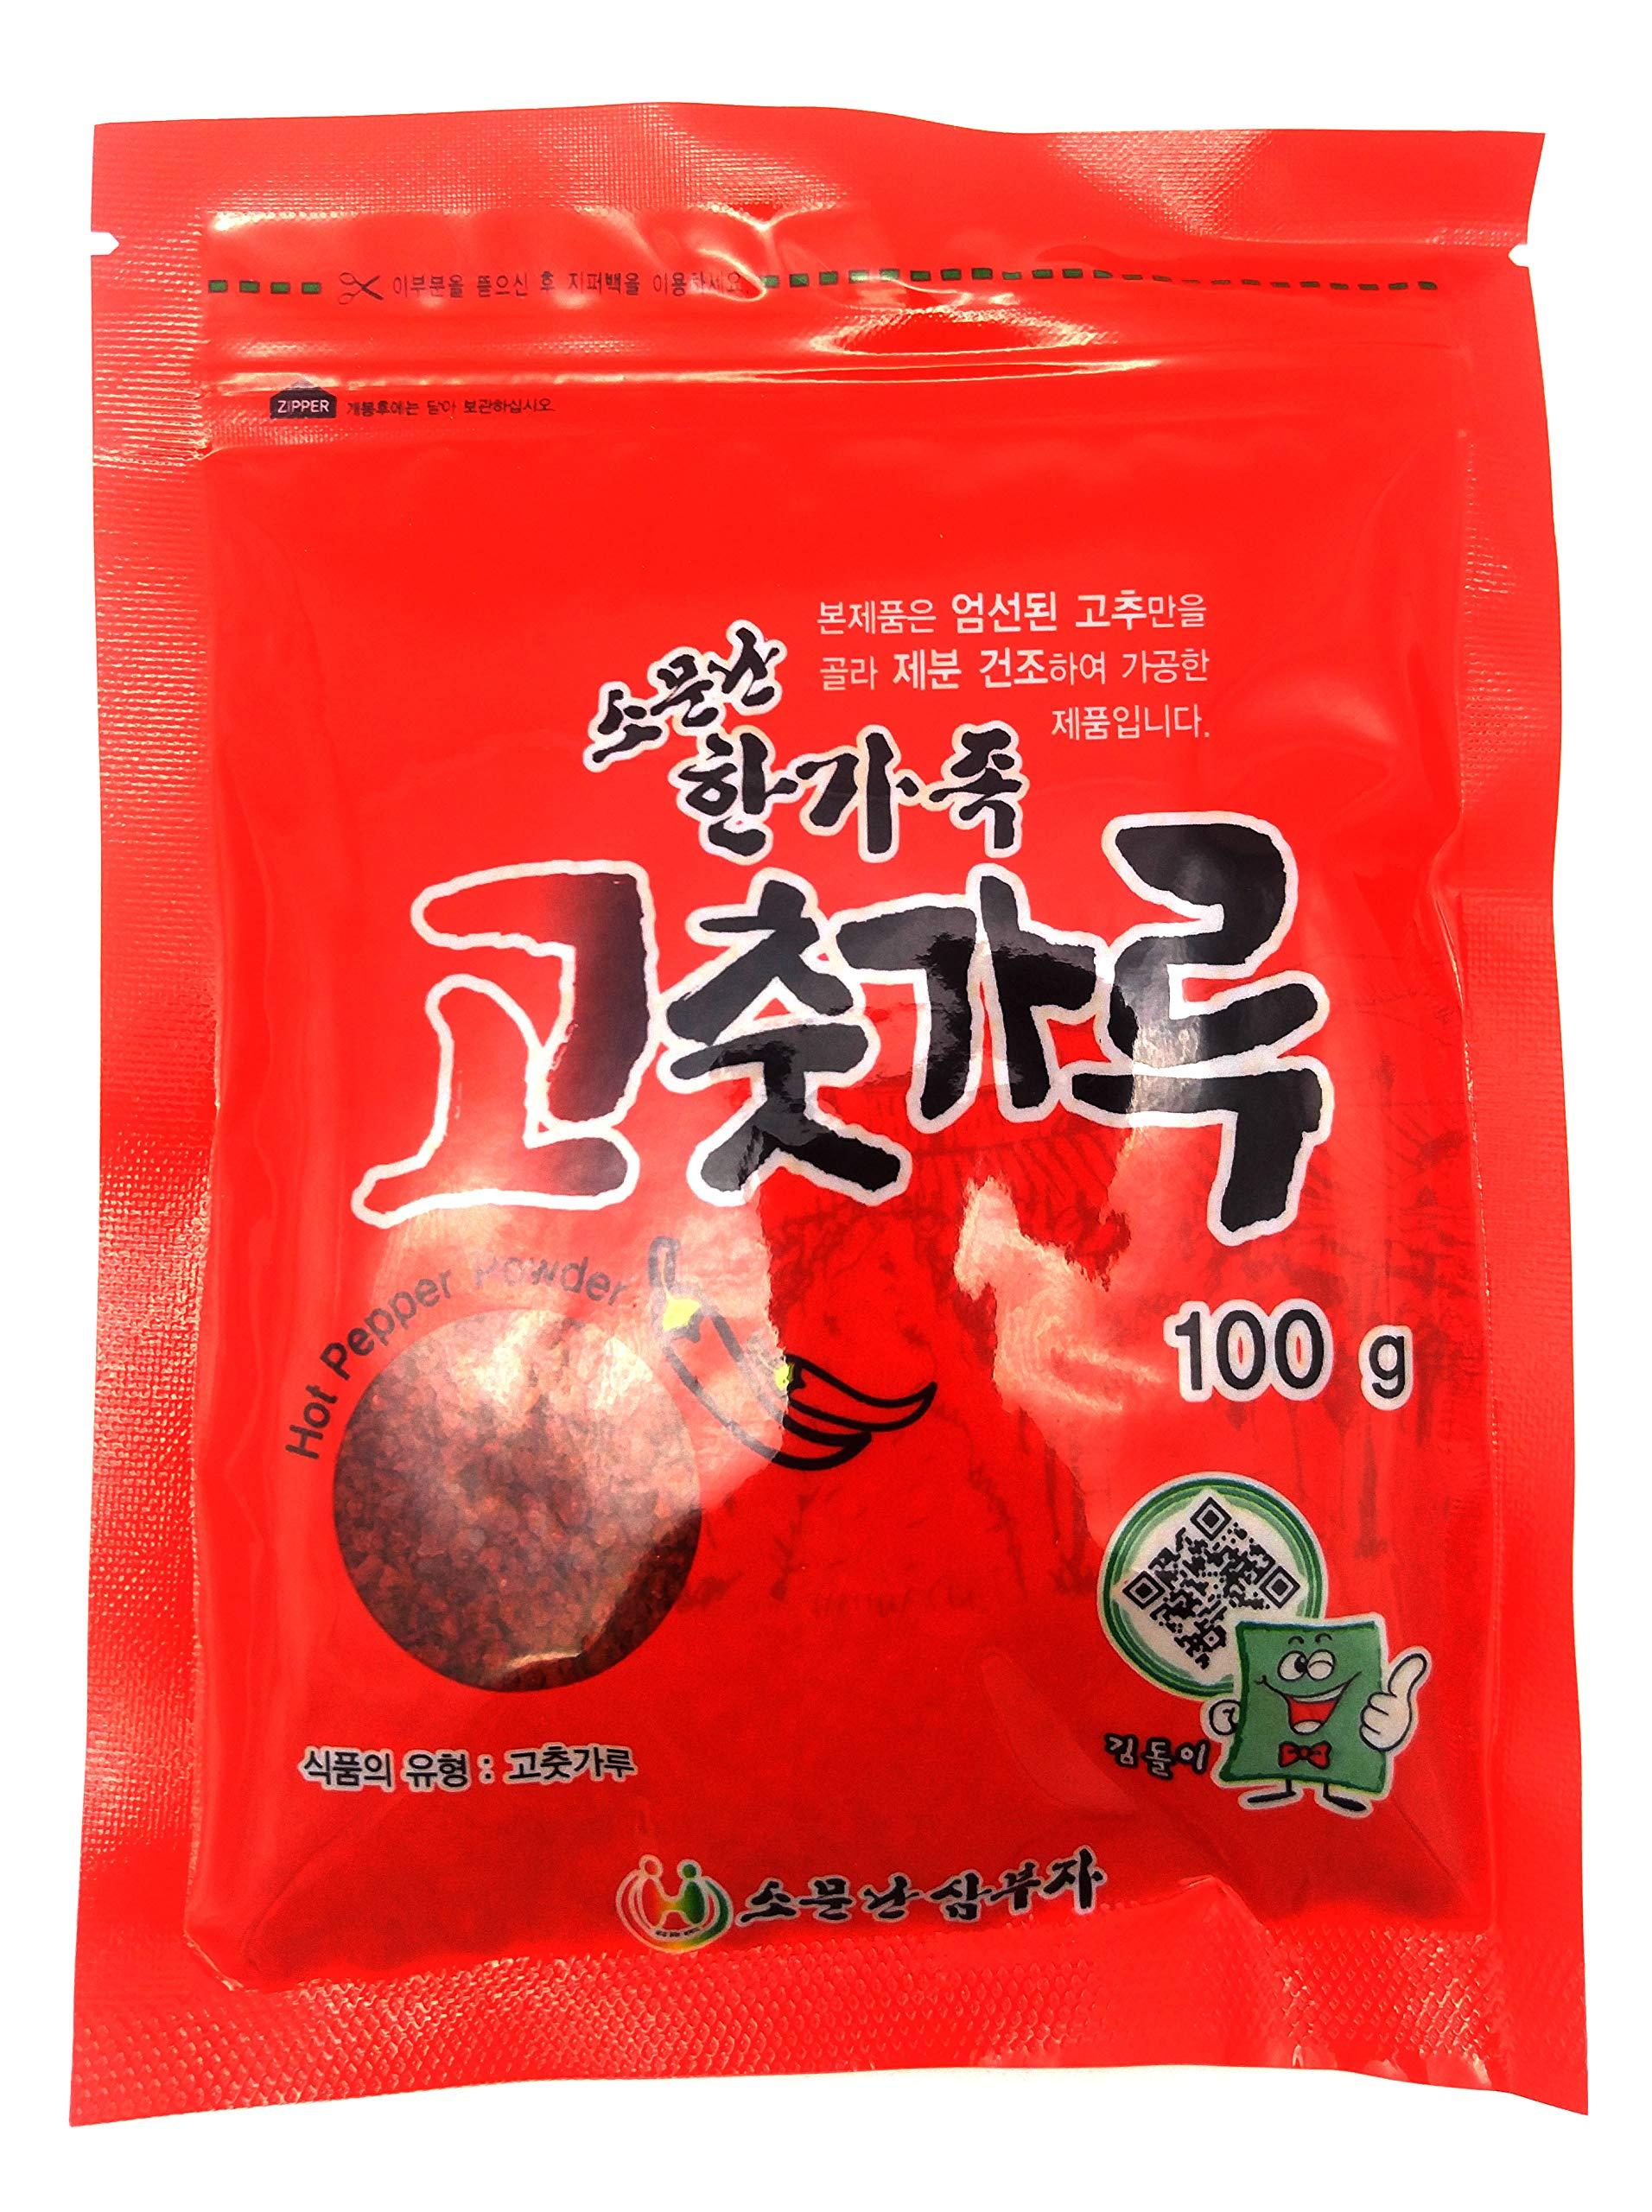 Korean Red Pepper Powder 3.52oz Spicy Chili Flakes